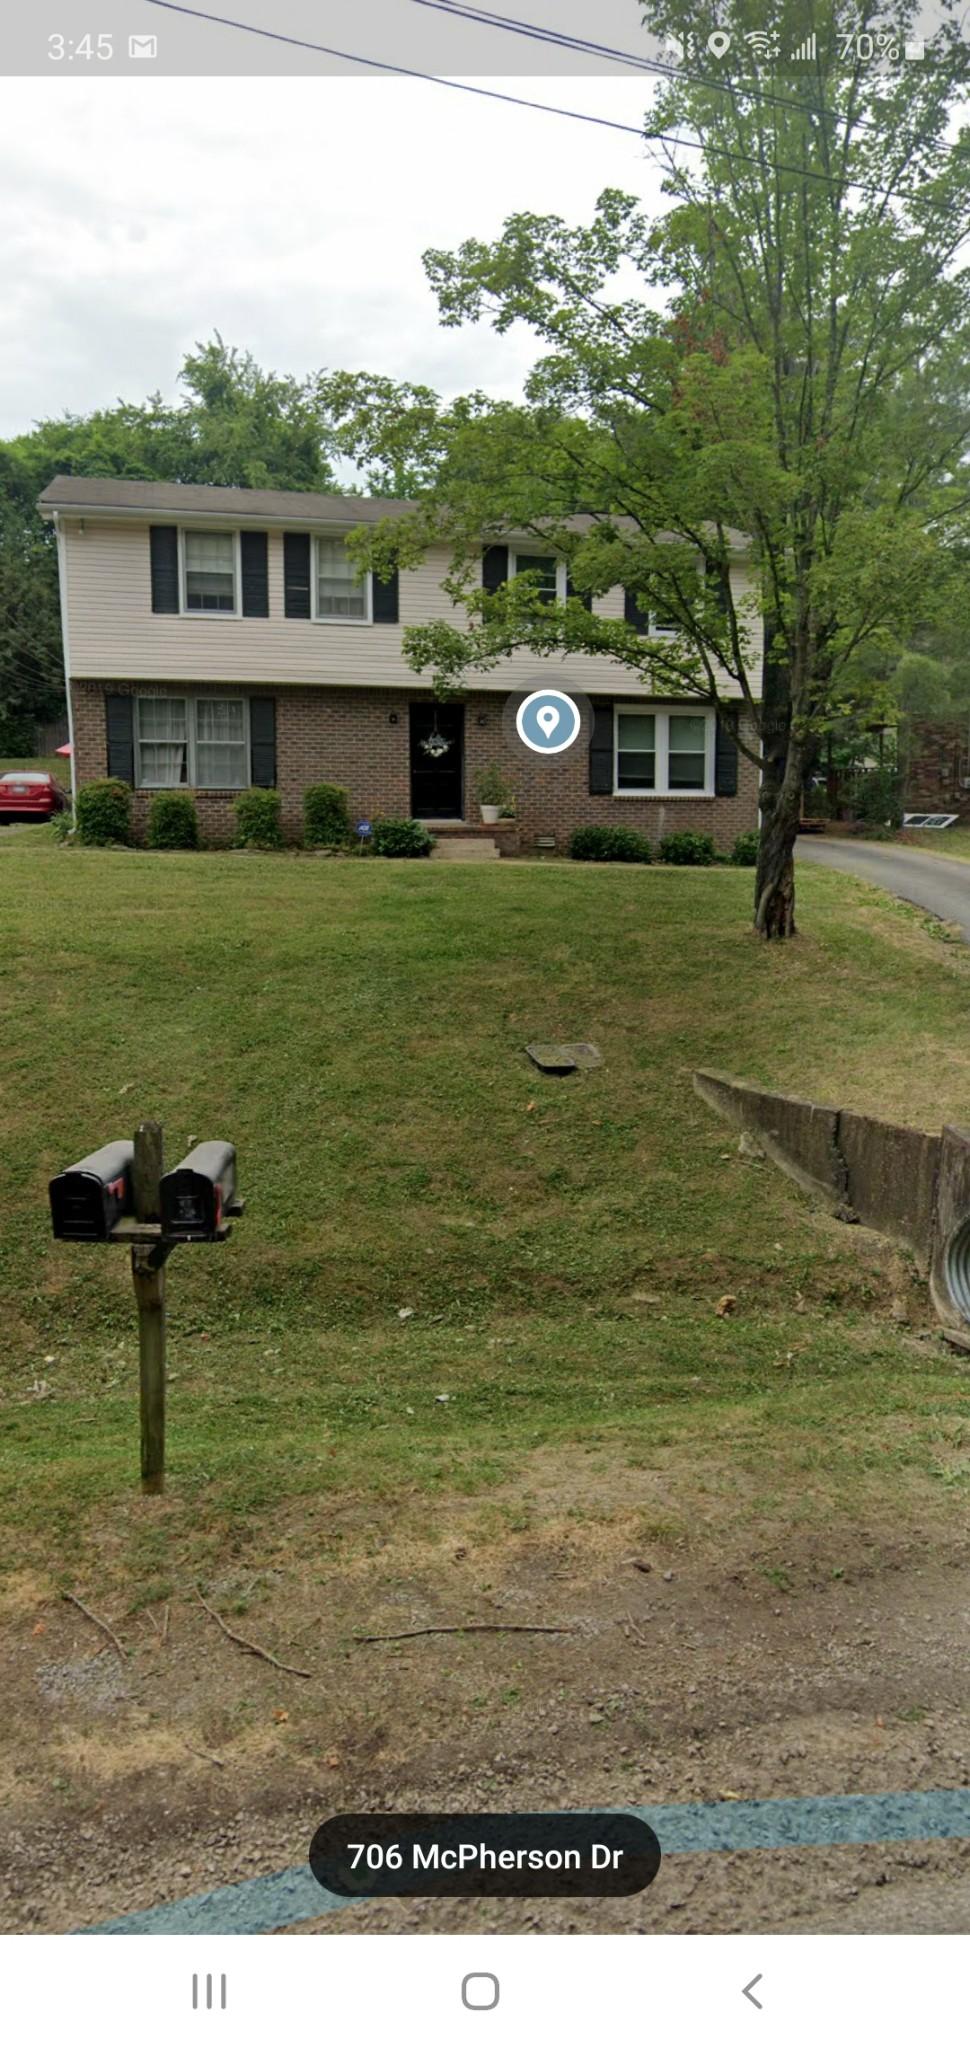 743 McPherson Dr Property Photo - Nashville, TN real estate listing